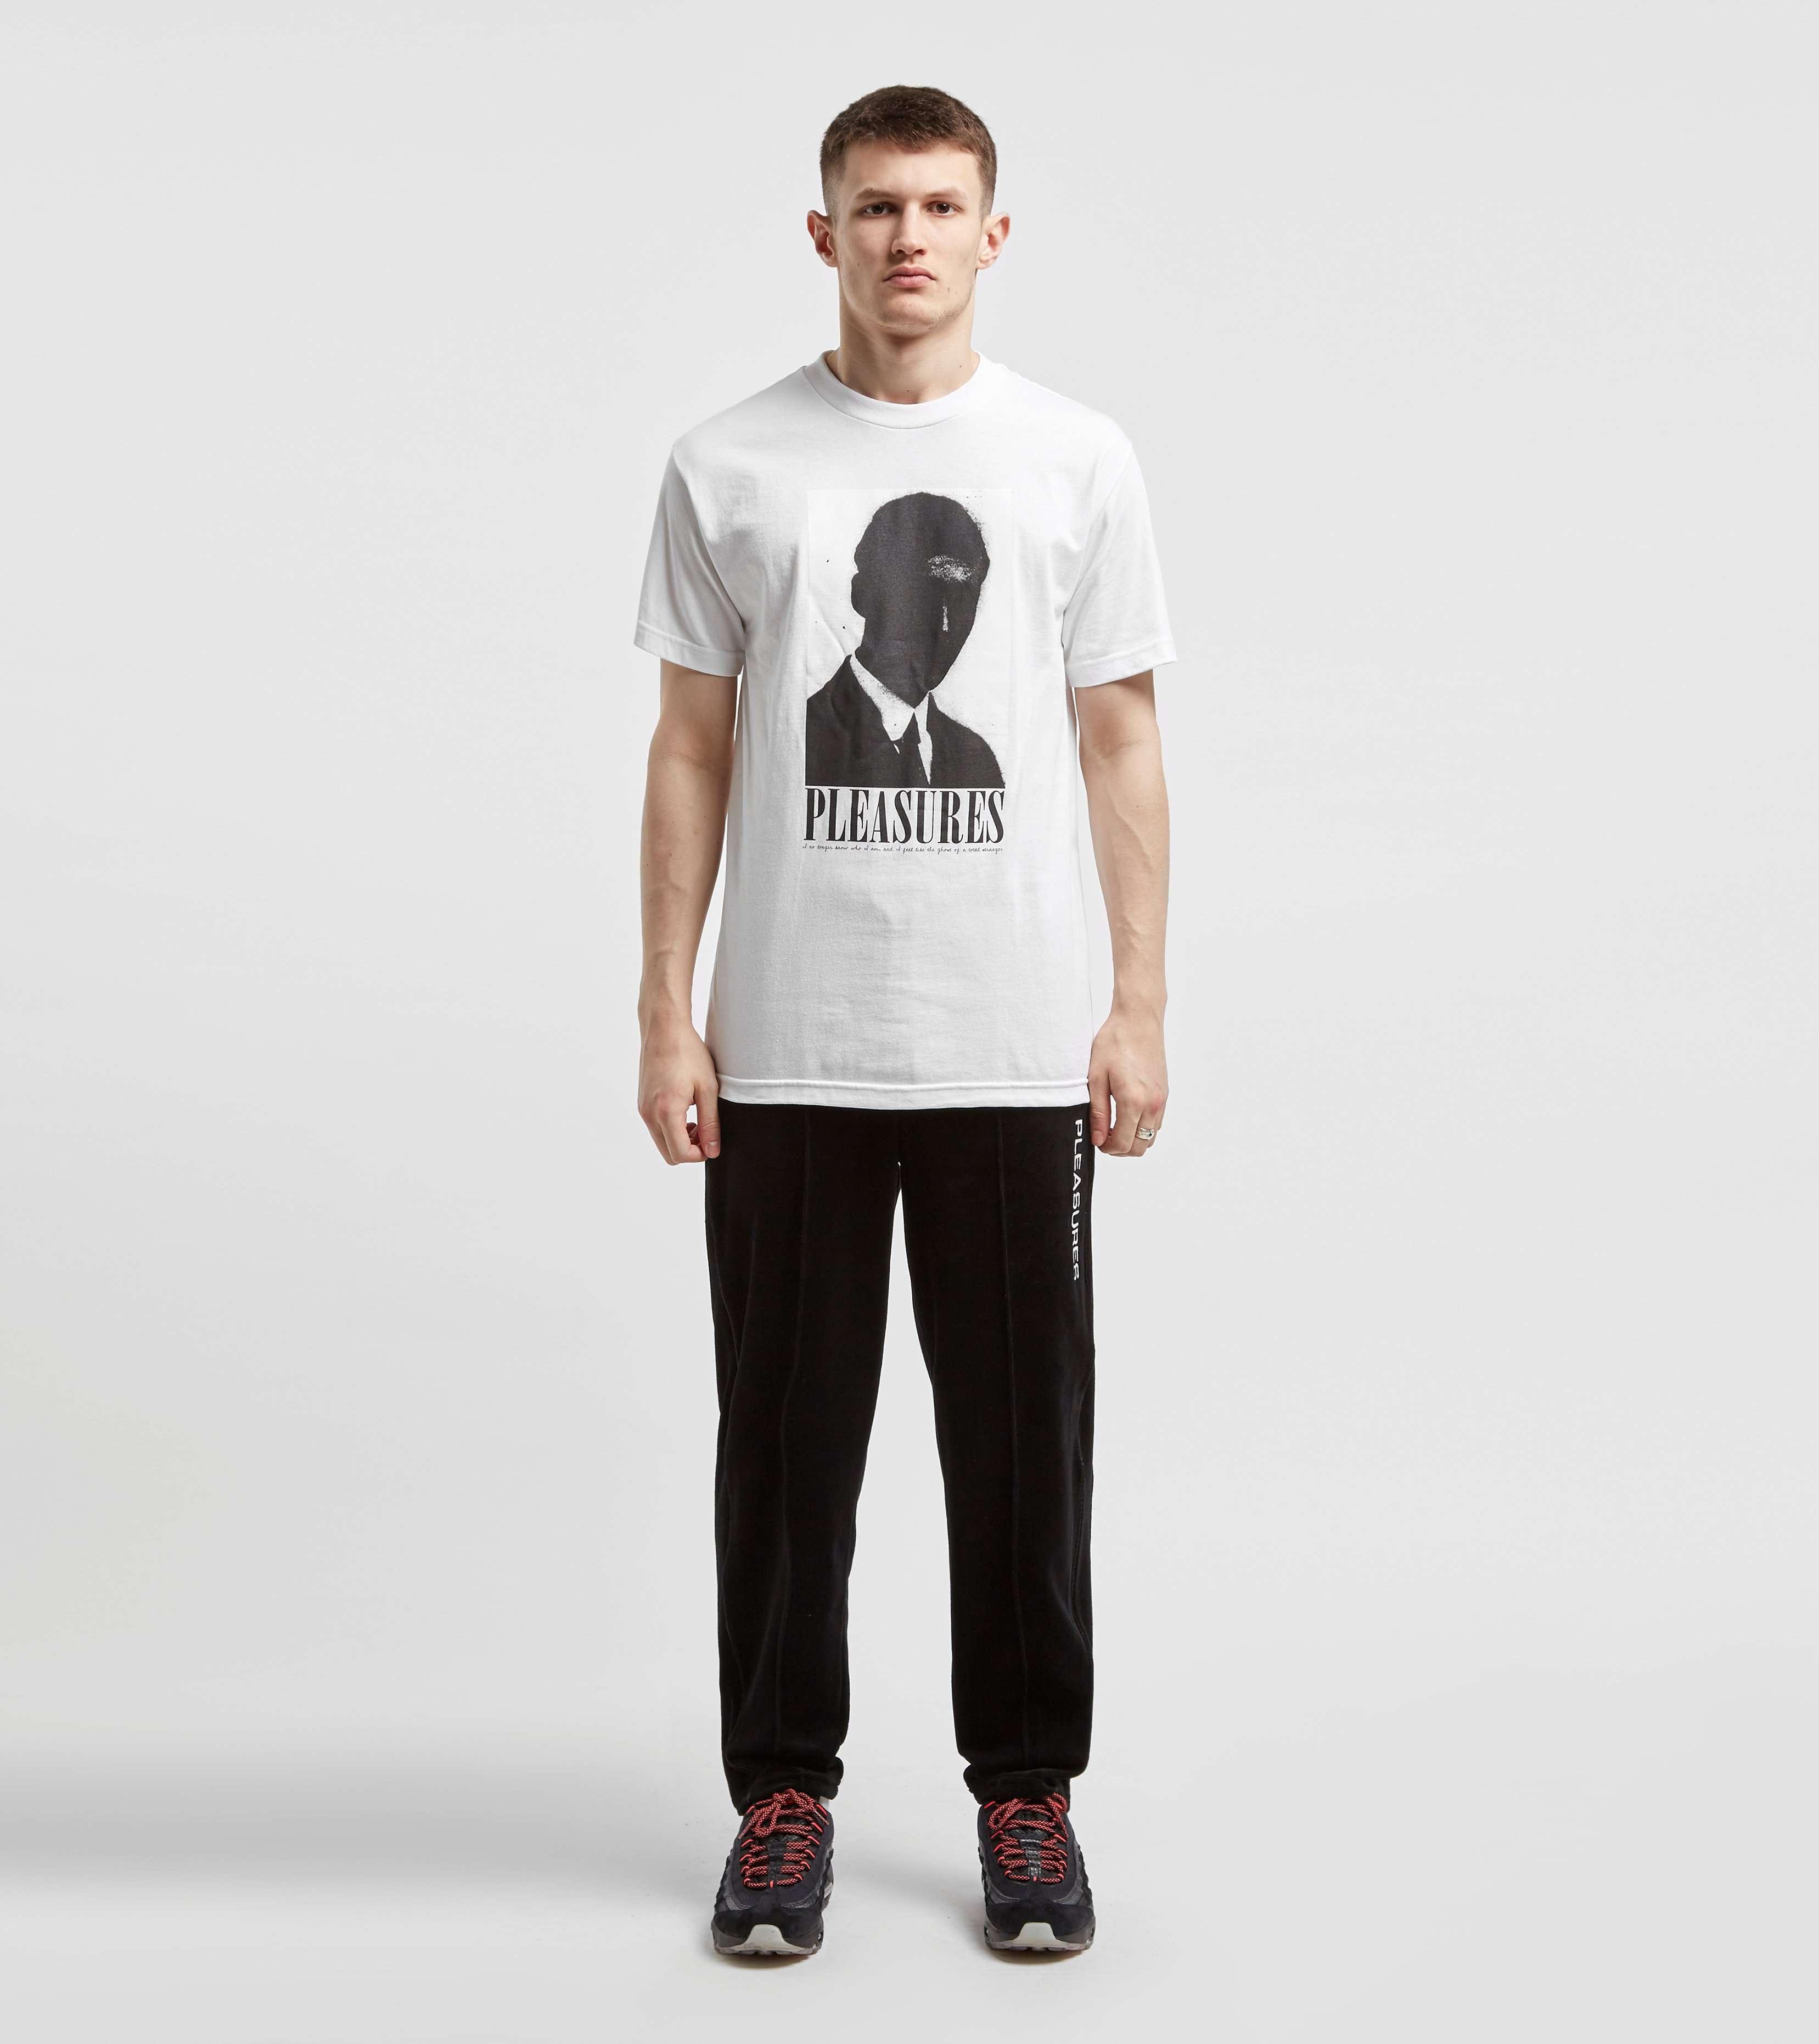 PLEASURES Ghost T-Shirt